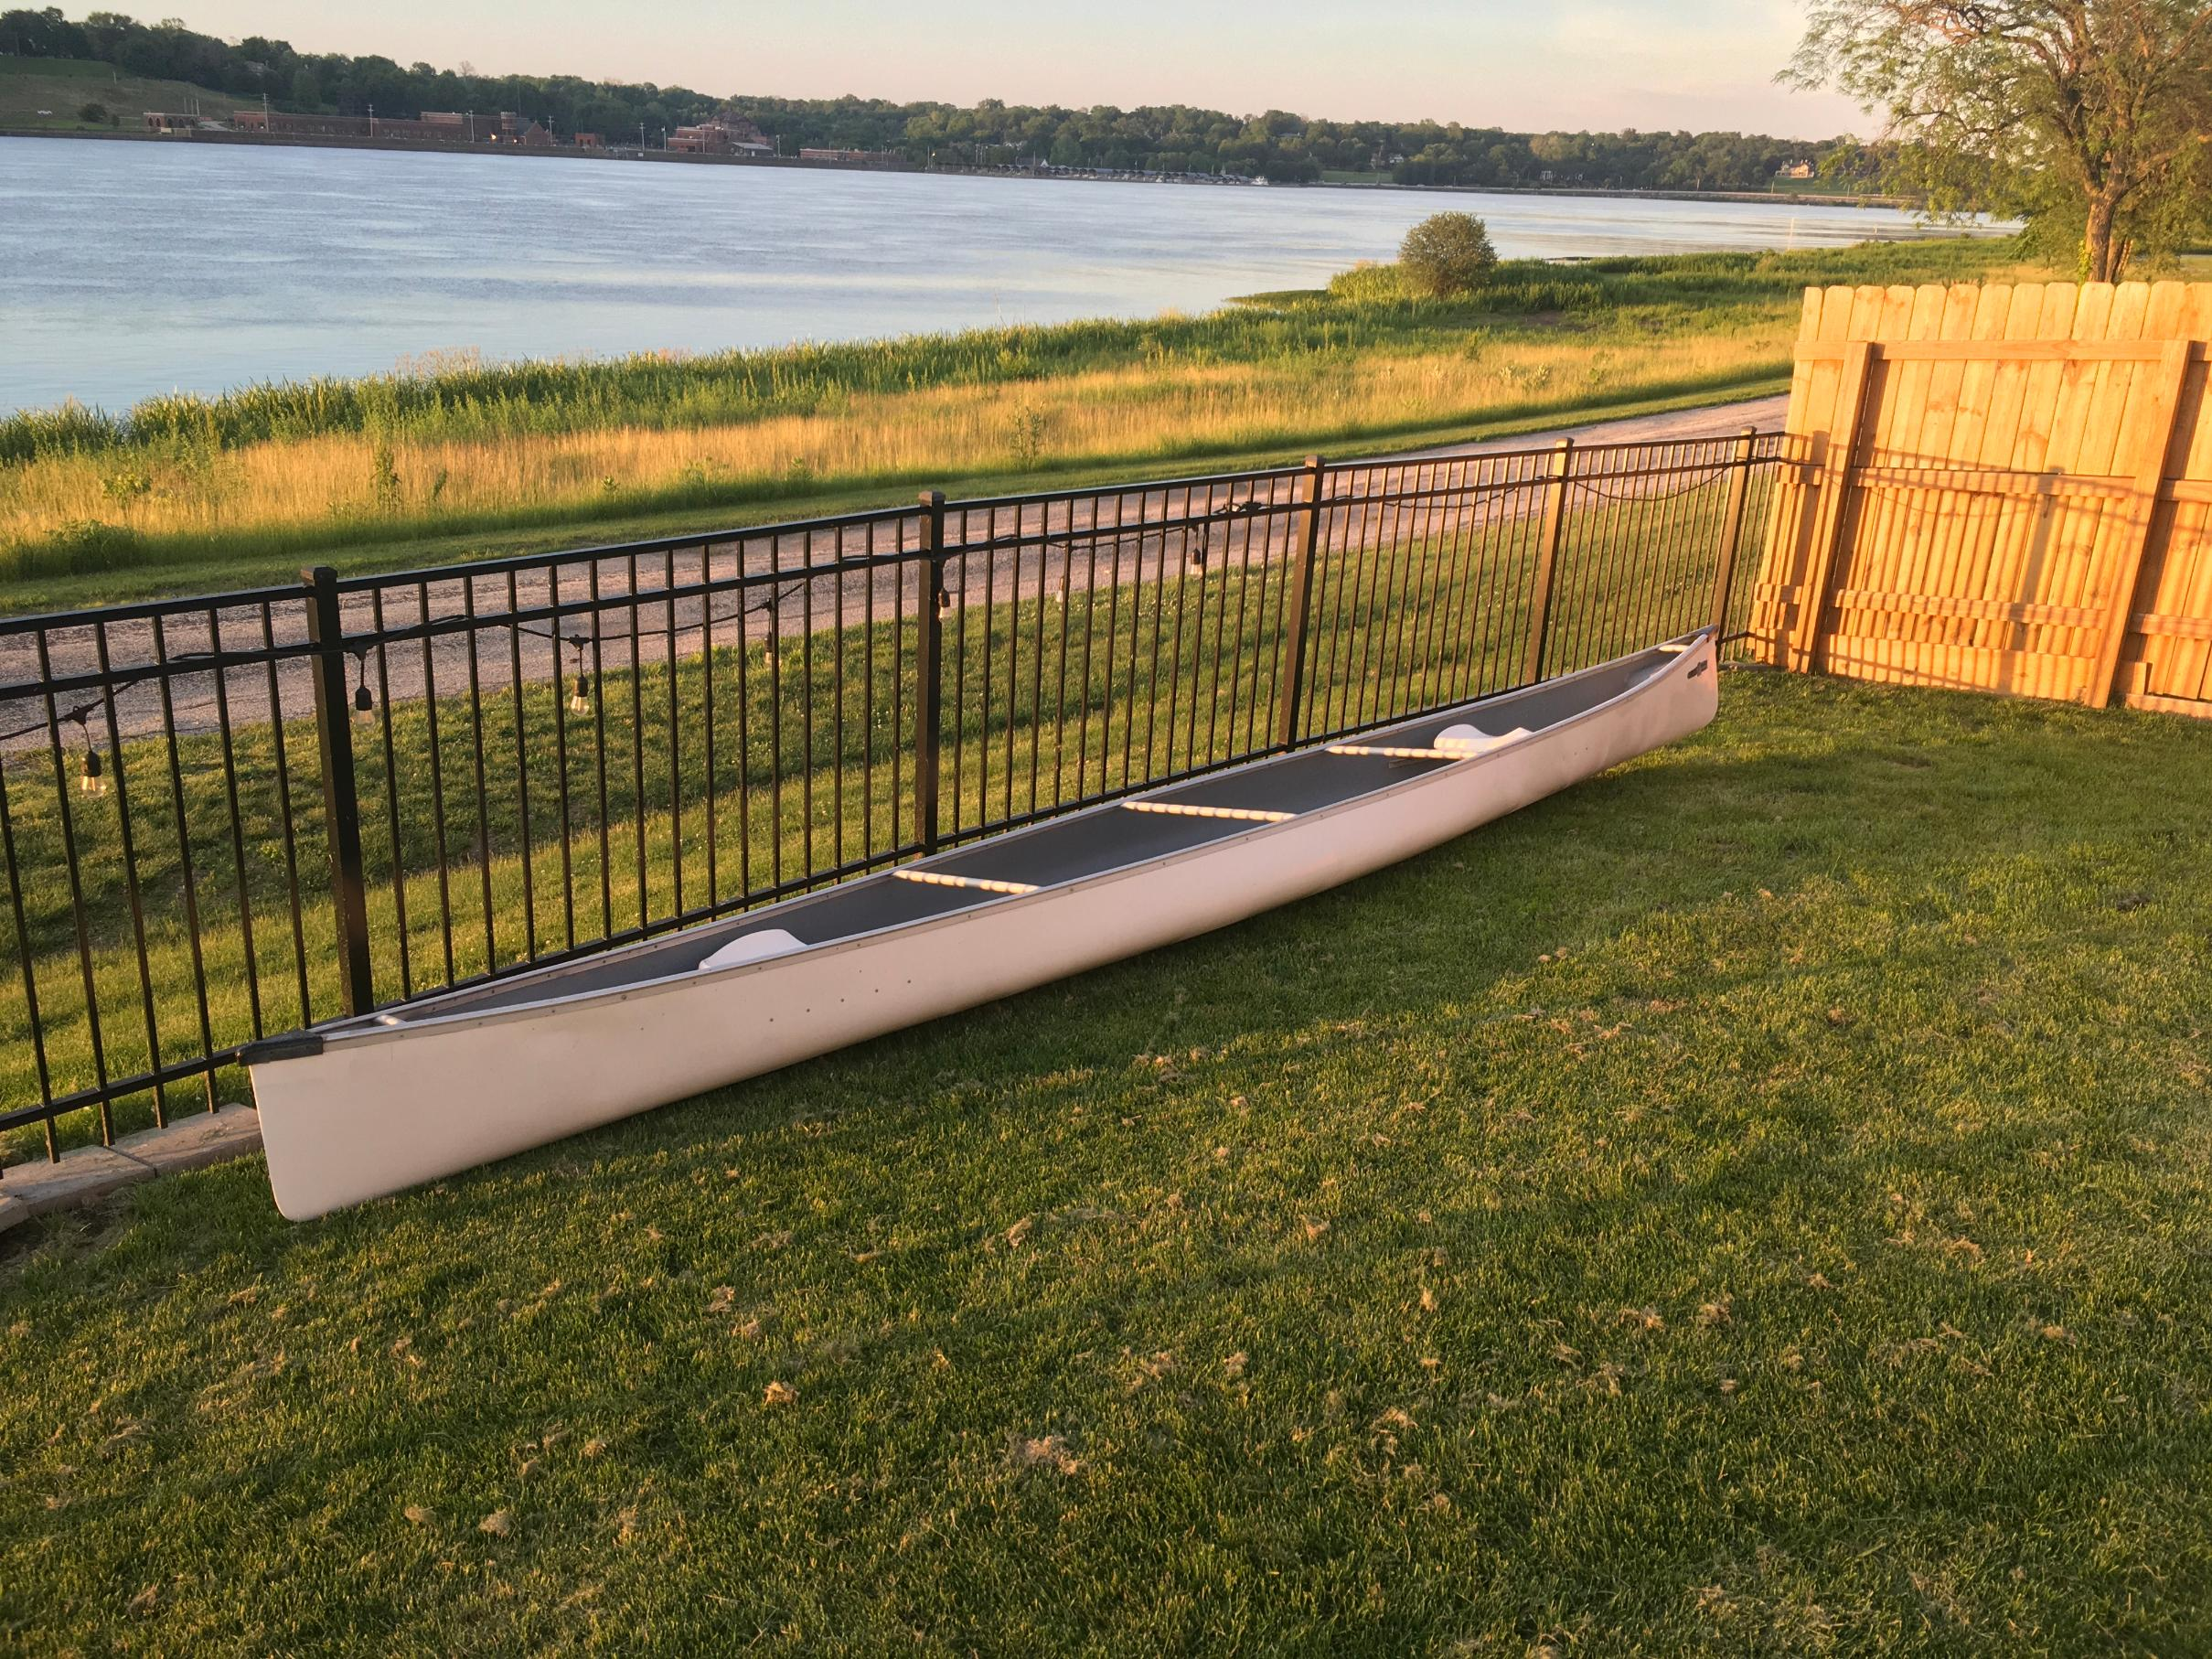 Sawyer Canoe